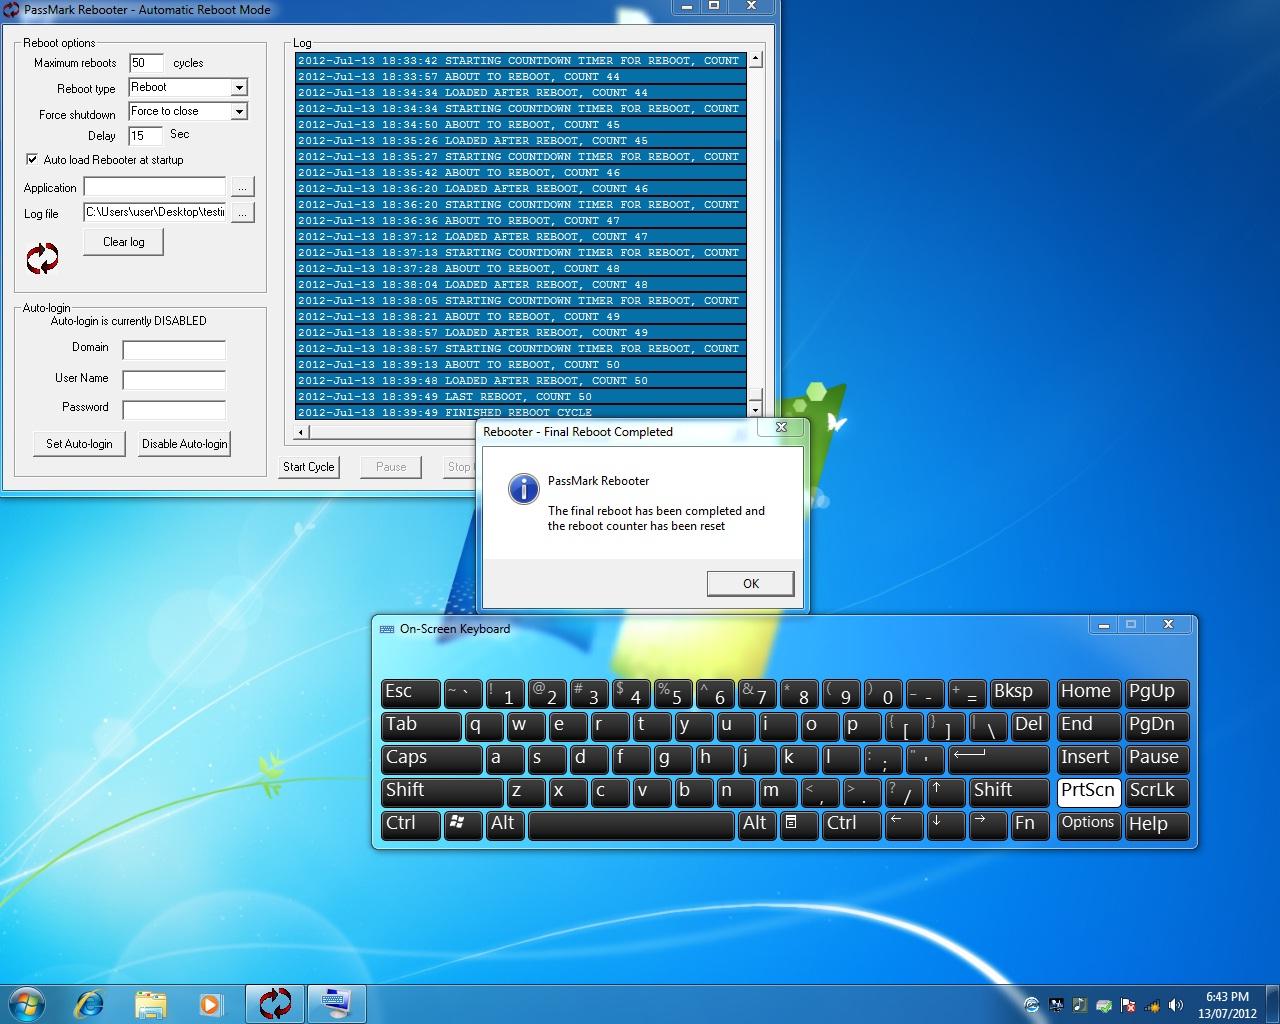 Passmark Rebooter